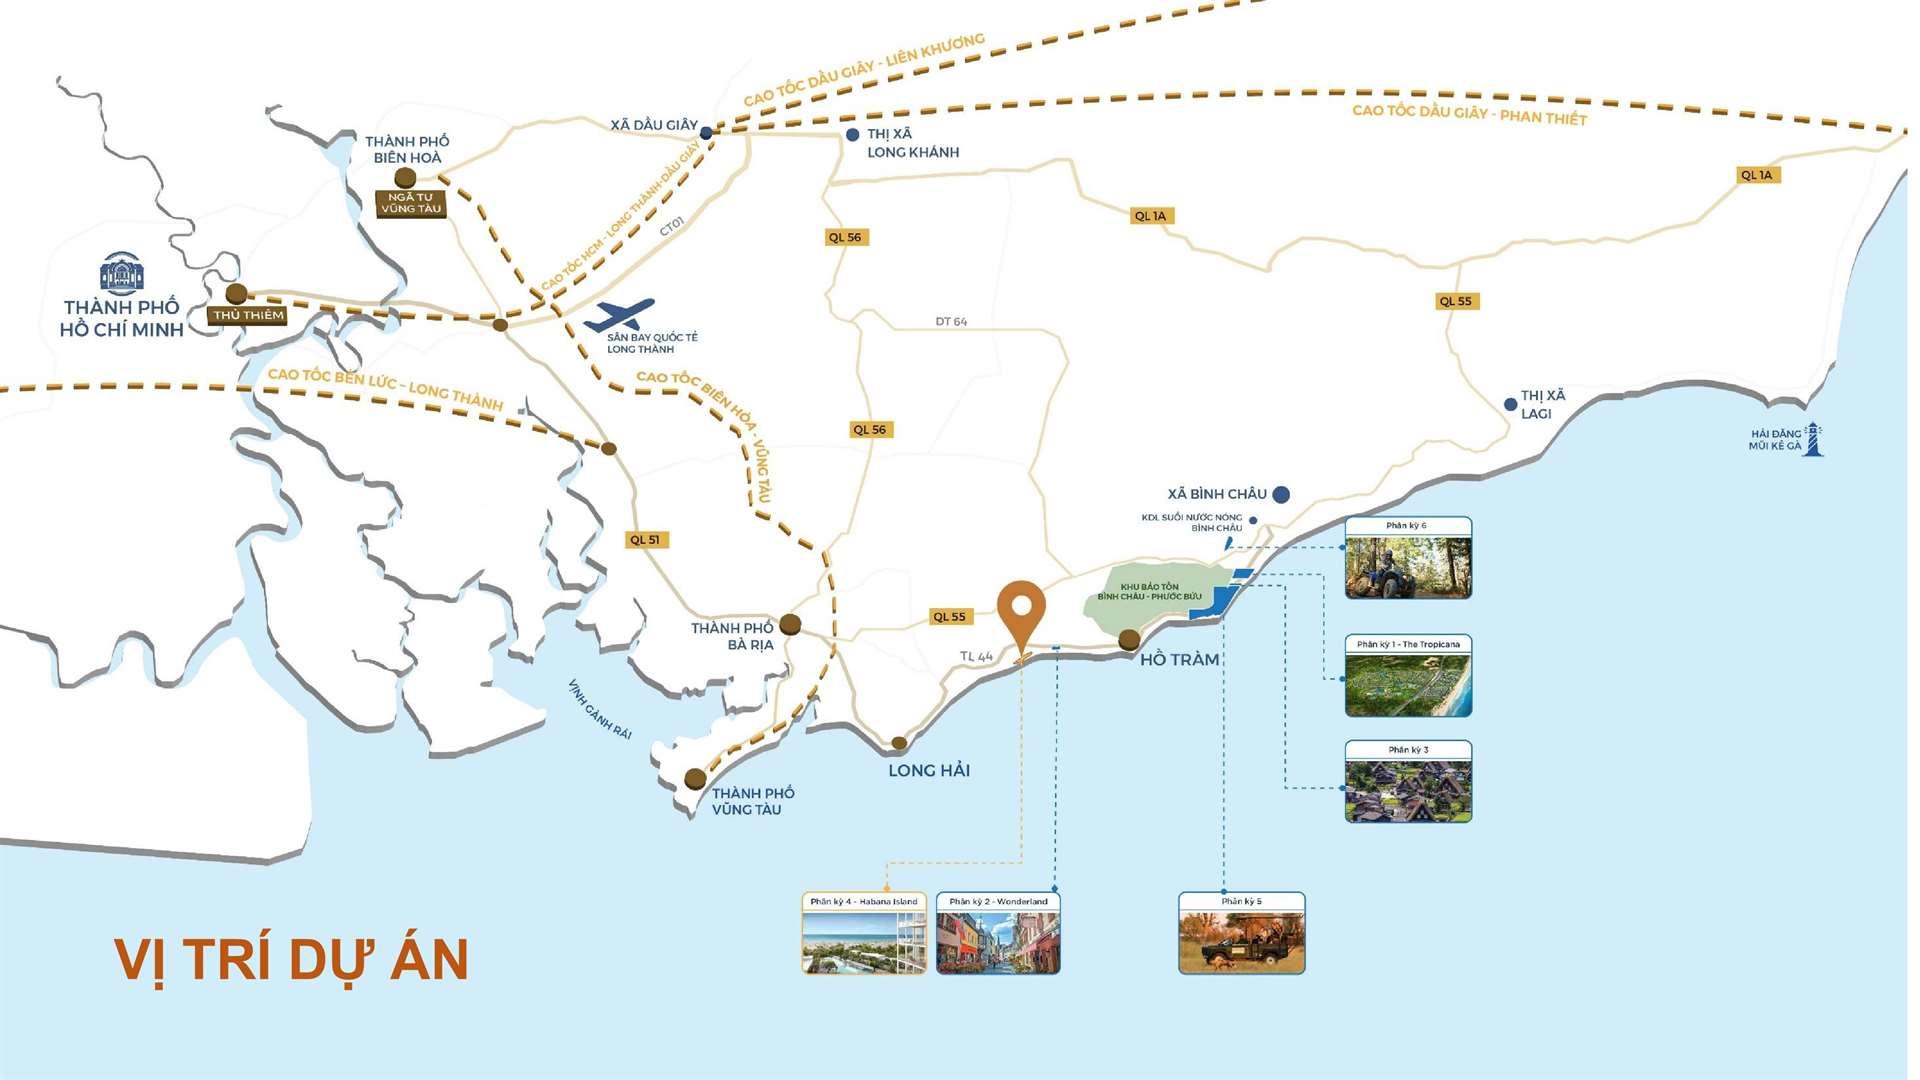 vi-tri-du-an-Habana-island-NovaWorld-Ho-Tram-novaland-dao-2-mat-tien